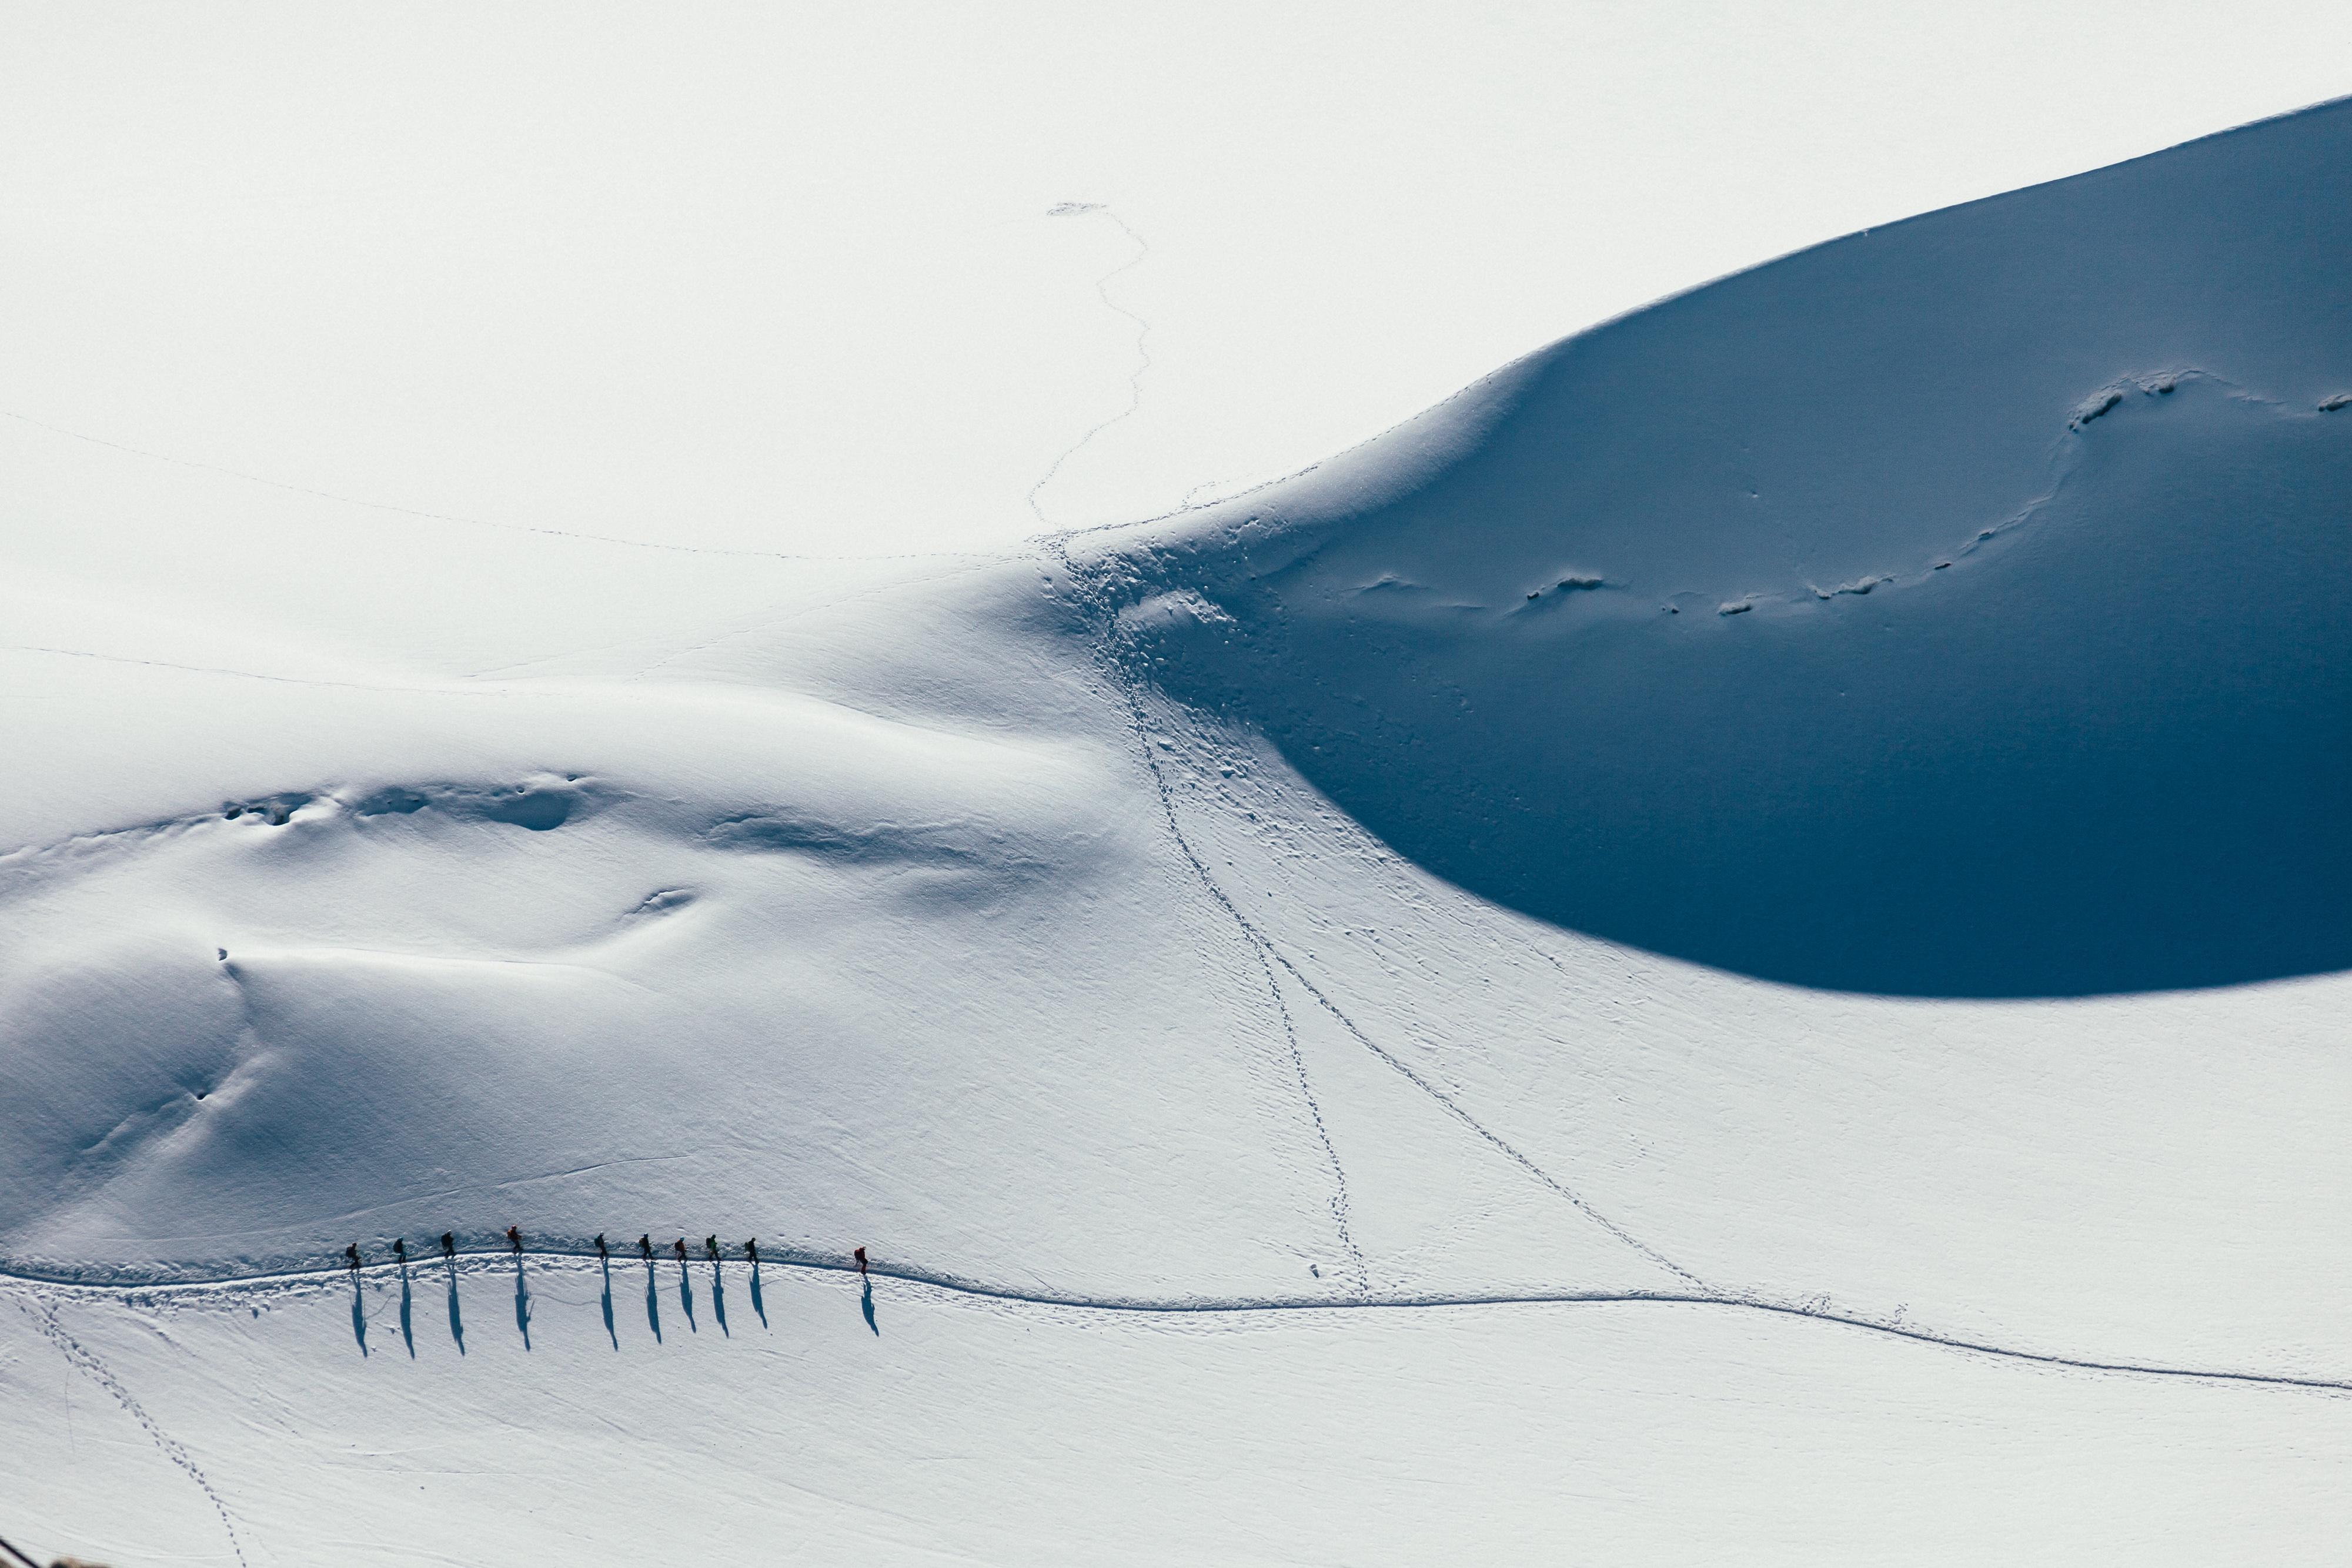 Giant White Mountain, Climb, Climber, Climbing, Cold, HQ Photo